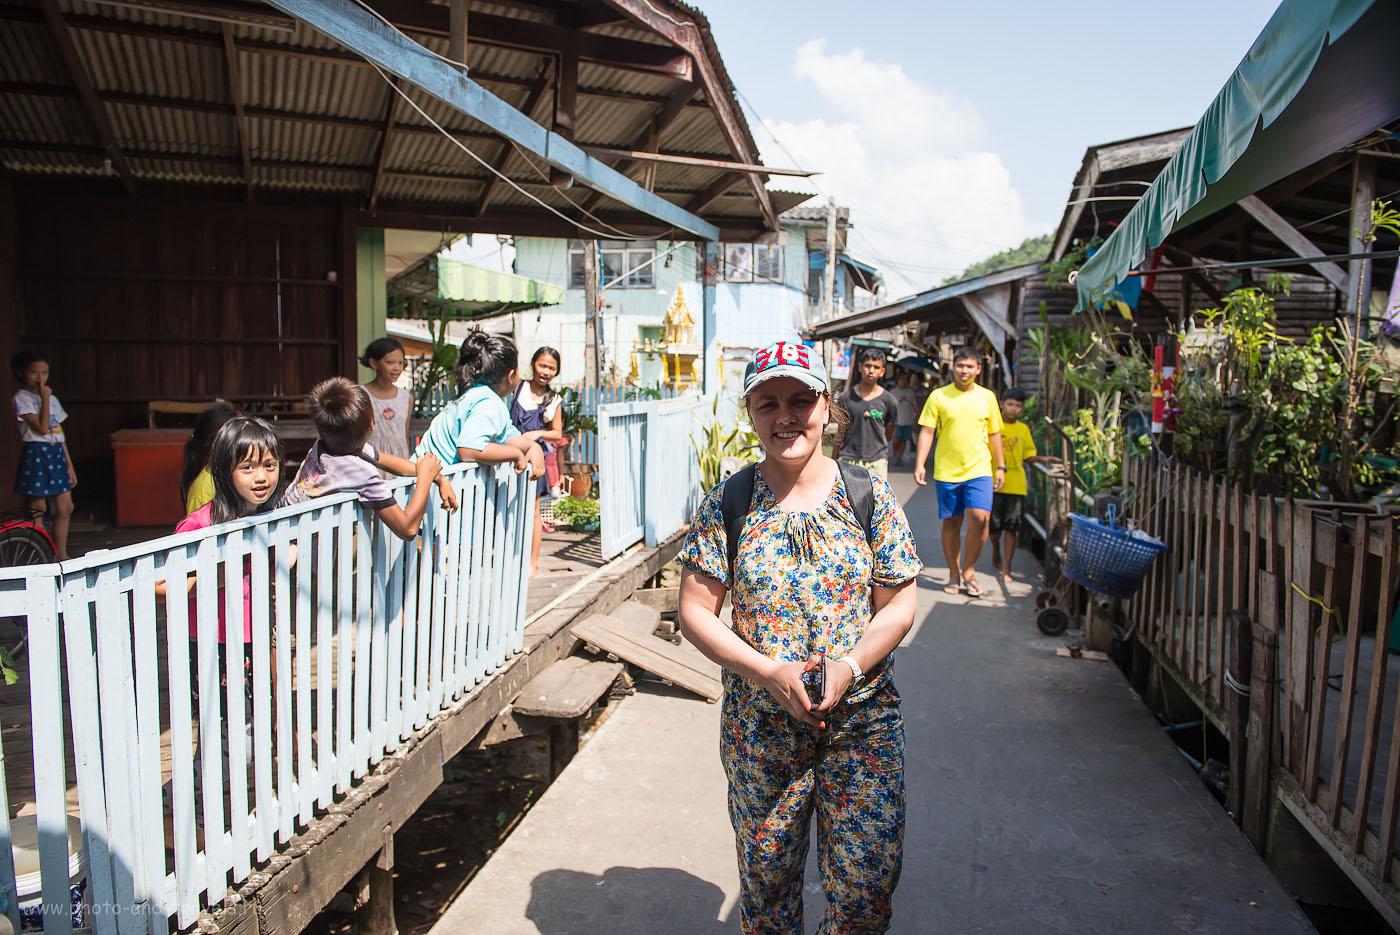 Фото 25. Путешествие по глубинке Таиланда. В центре внимания (320, 24, 4.0, 1/250)